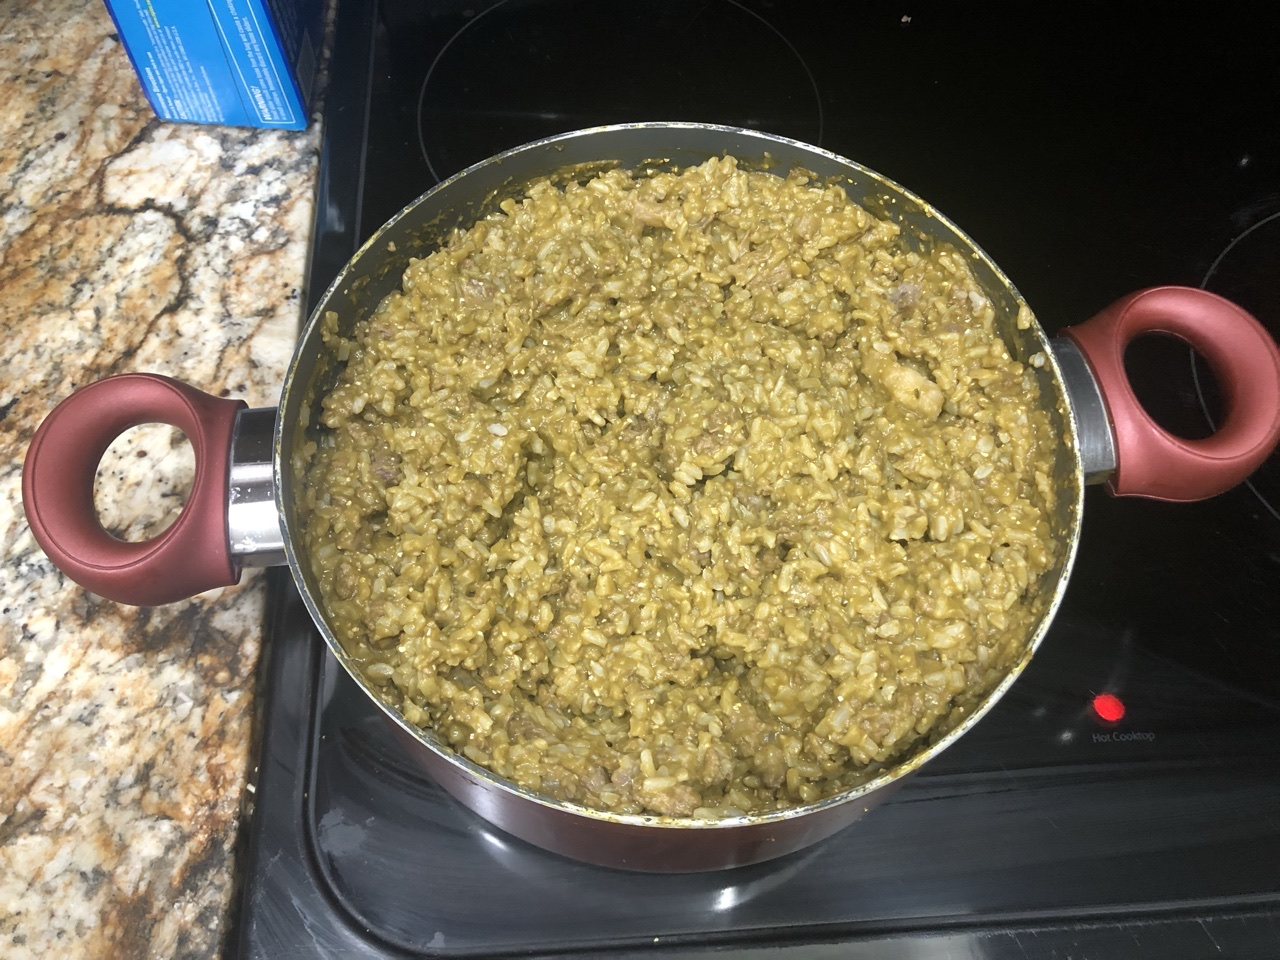 Homemade Dog Food with Beef